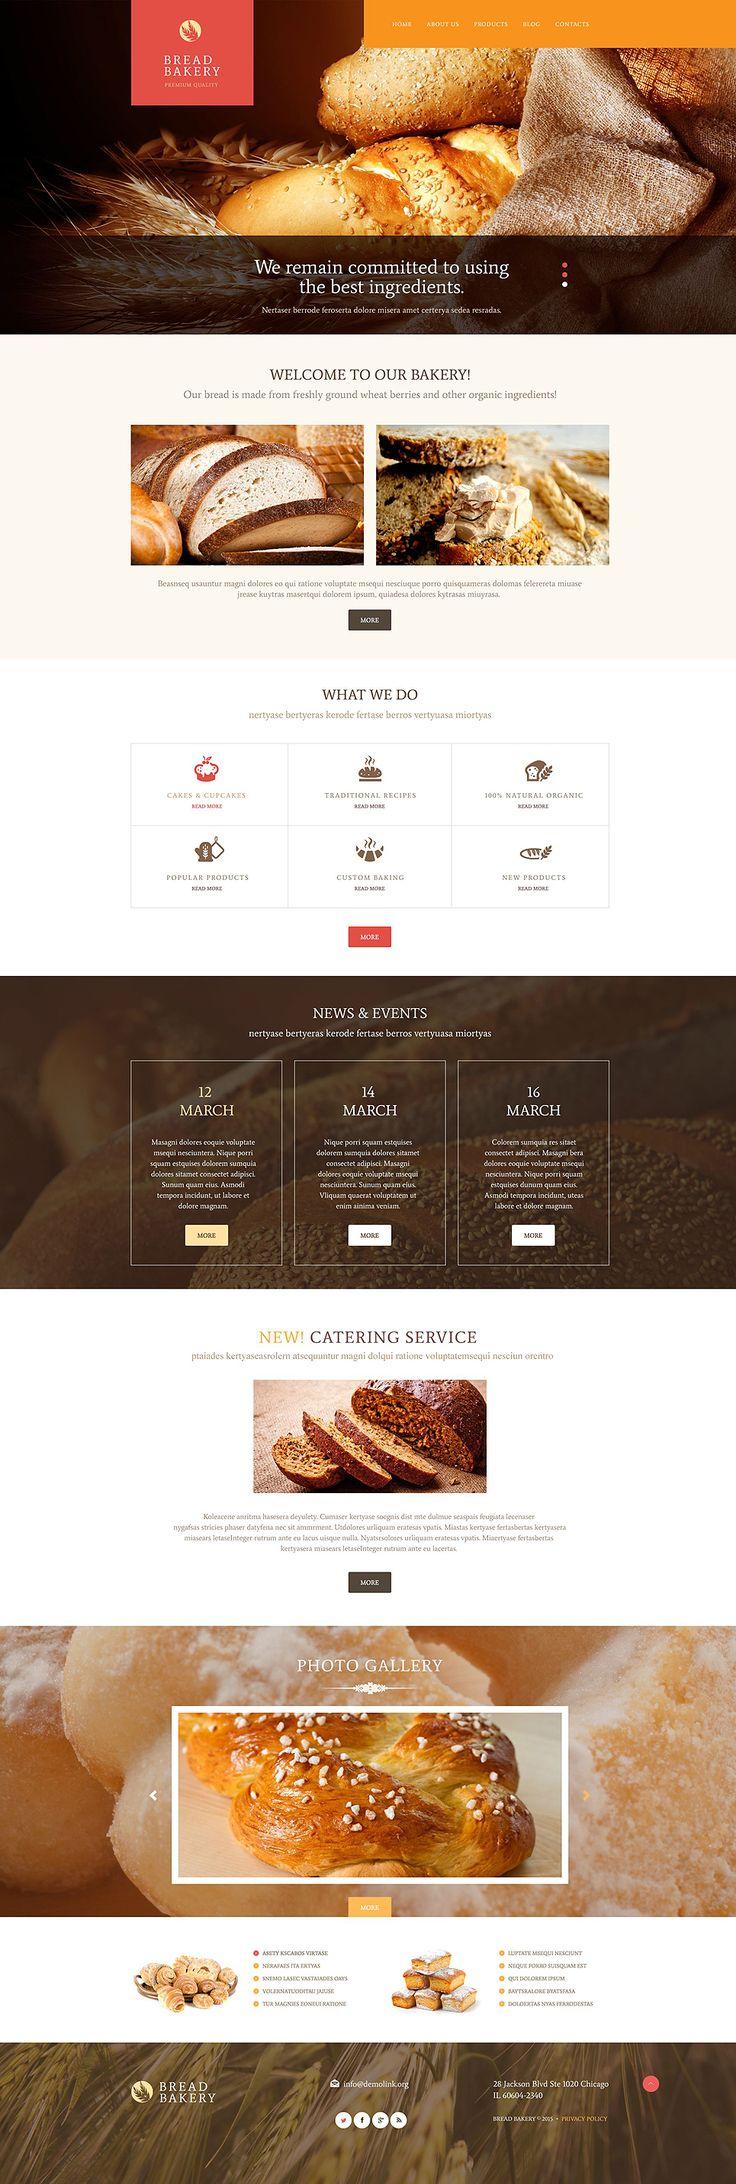 bakery #wordpress template #wordpresstheme wordpress website template